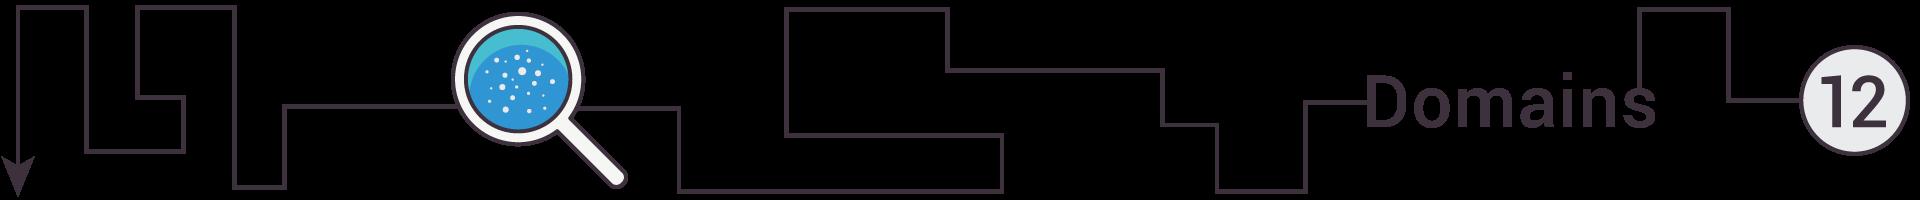 12. Domains